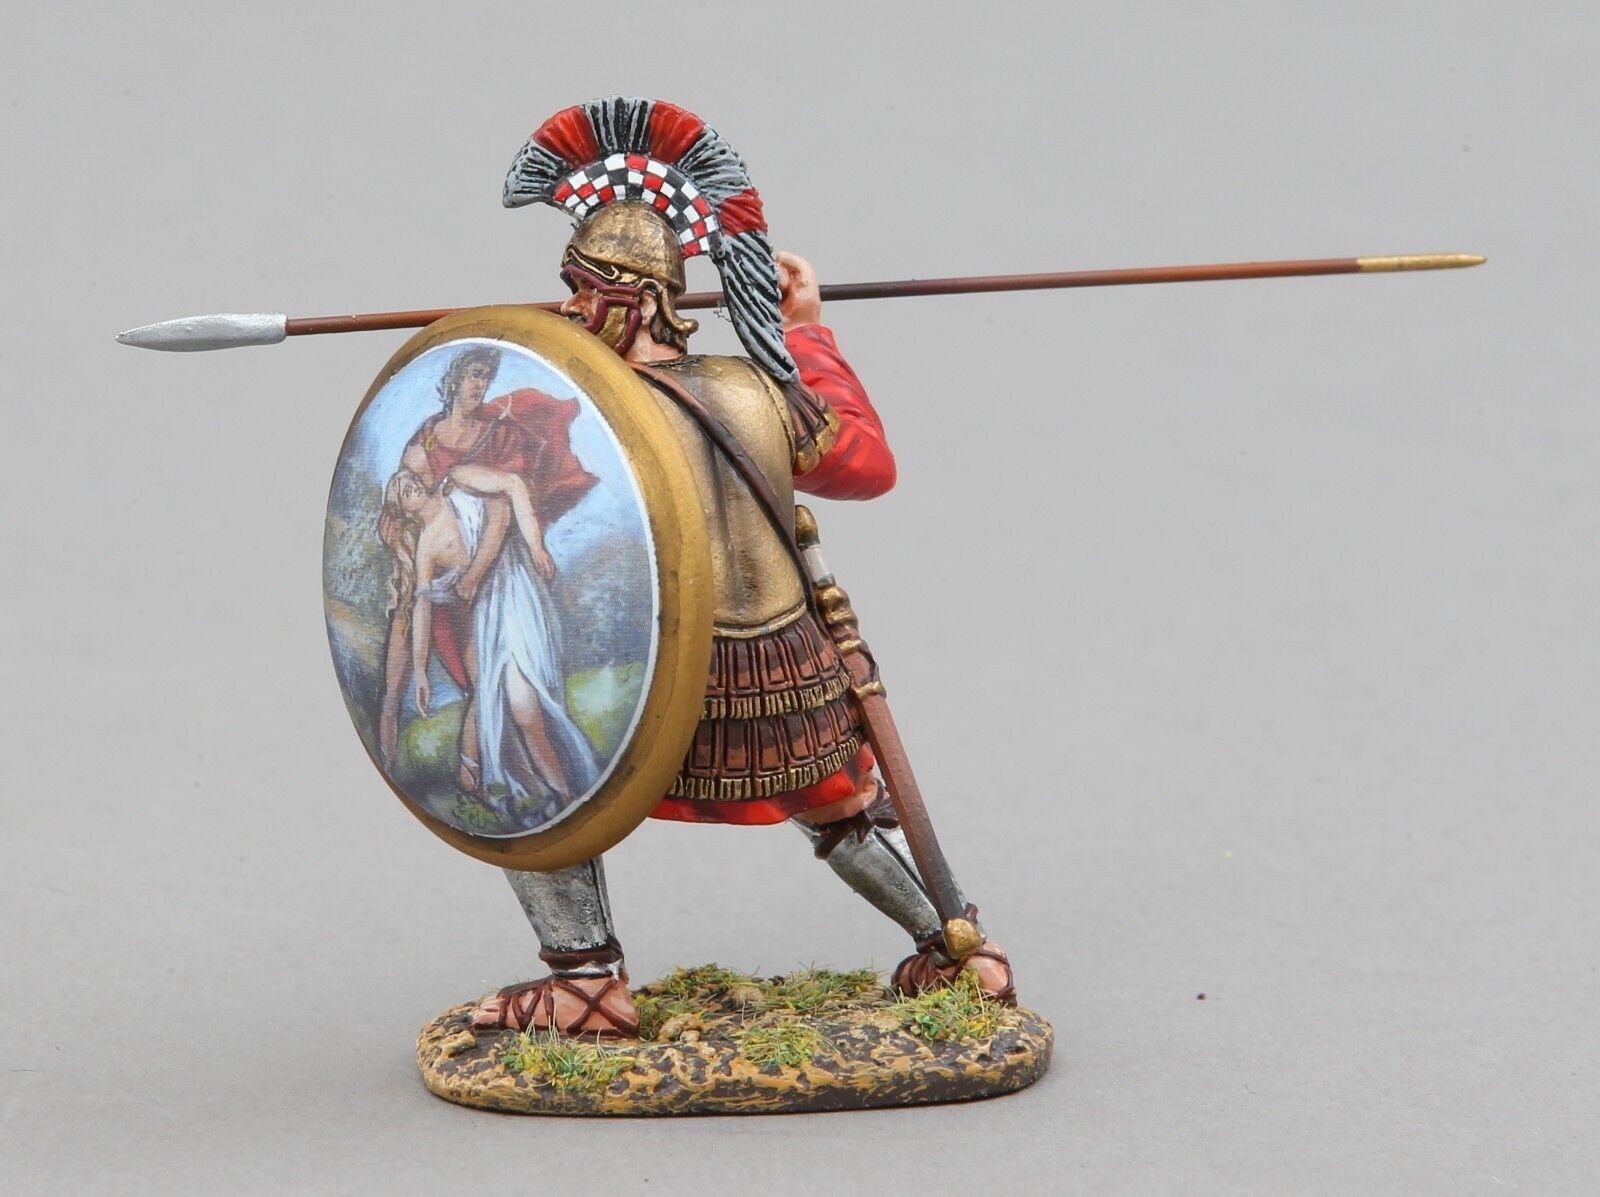 THOMAS GUNN ANTIENT GREKS, PERSIANS SPAN046C SPkonstANS SHIELD WALL ORPHEUS SHIELD